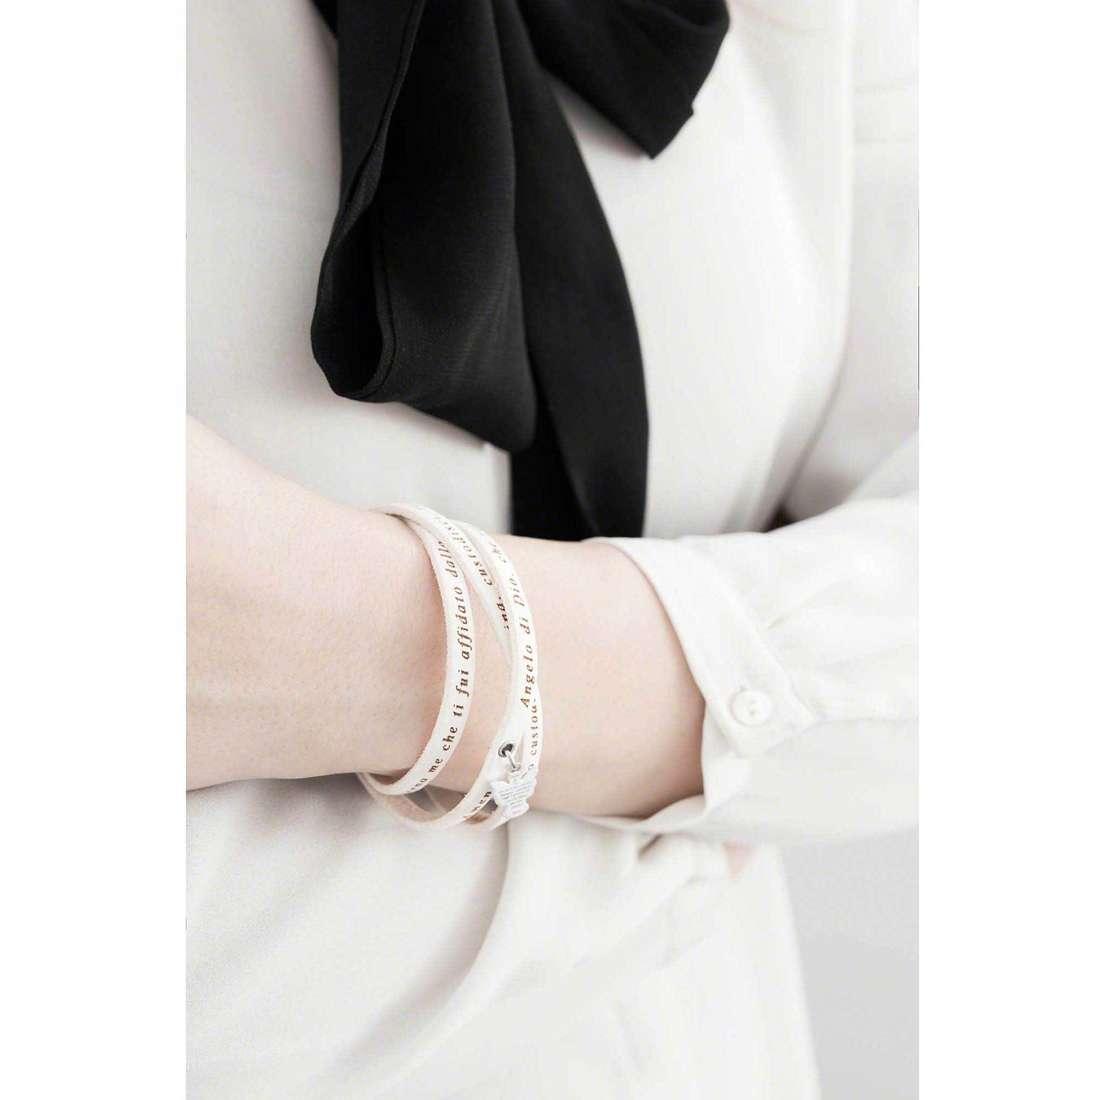 Amen bracelets Angelo di Dio femme AS-ADIT07-54 indosso